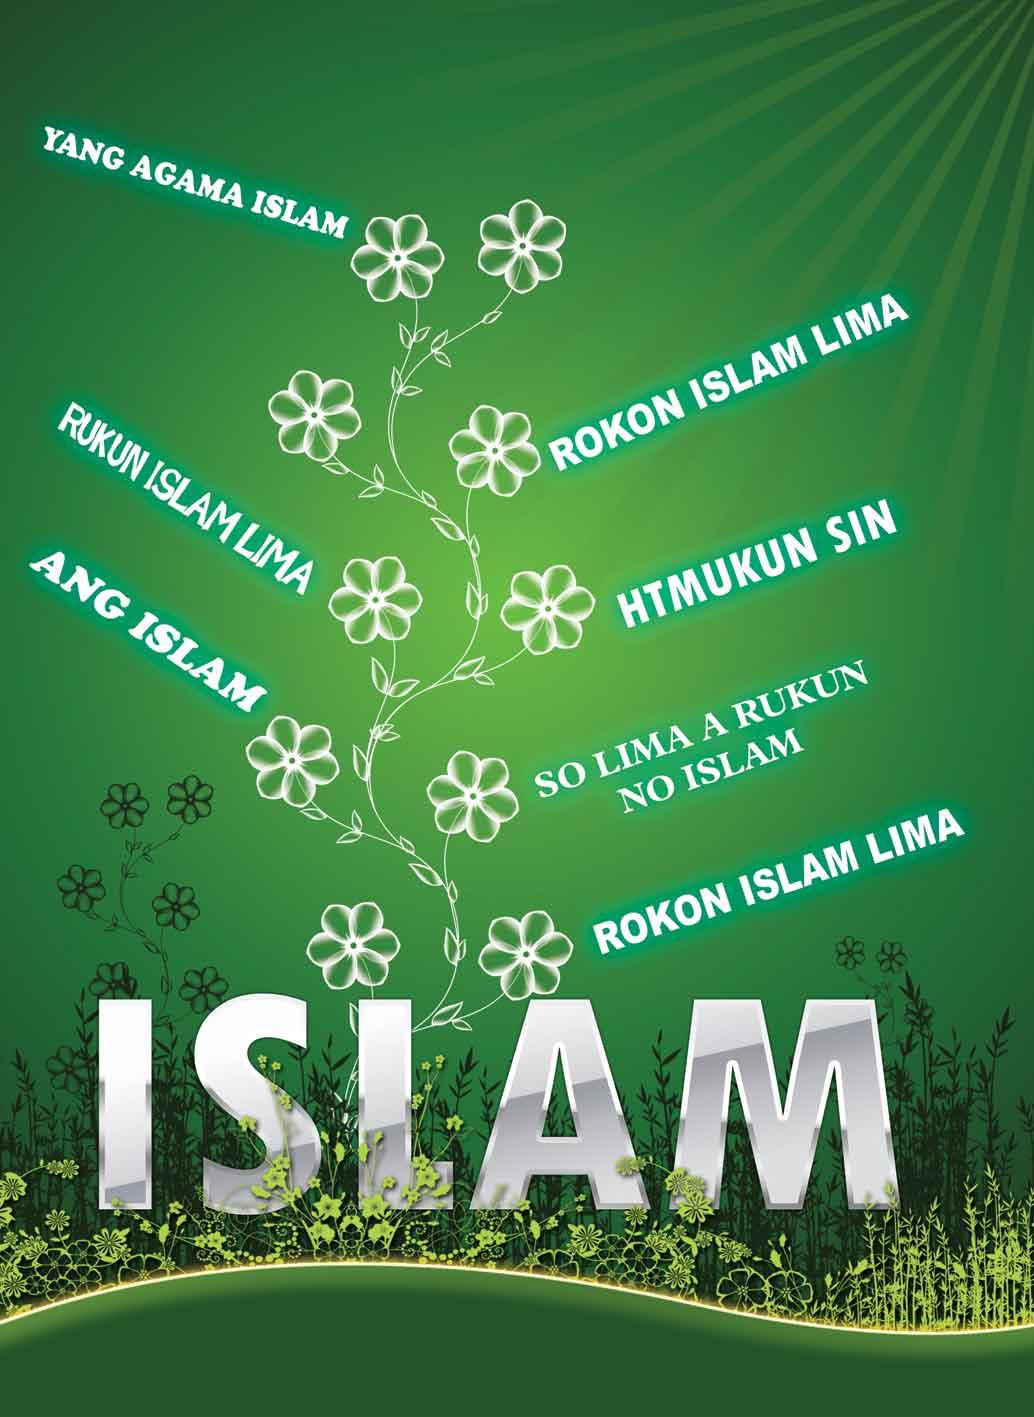 SO LIMA A RUKUN NO ISLAM